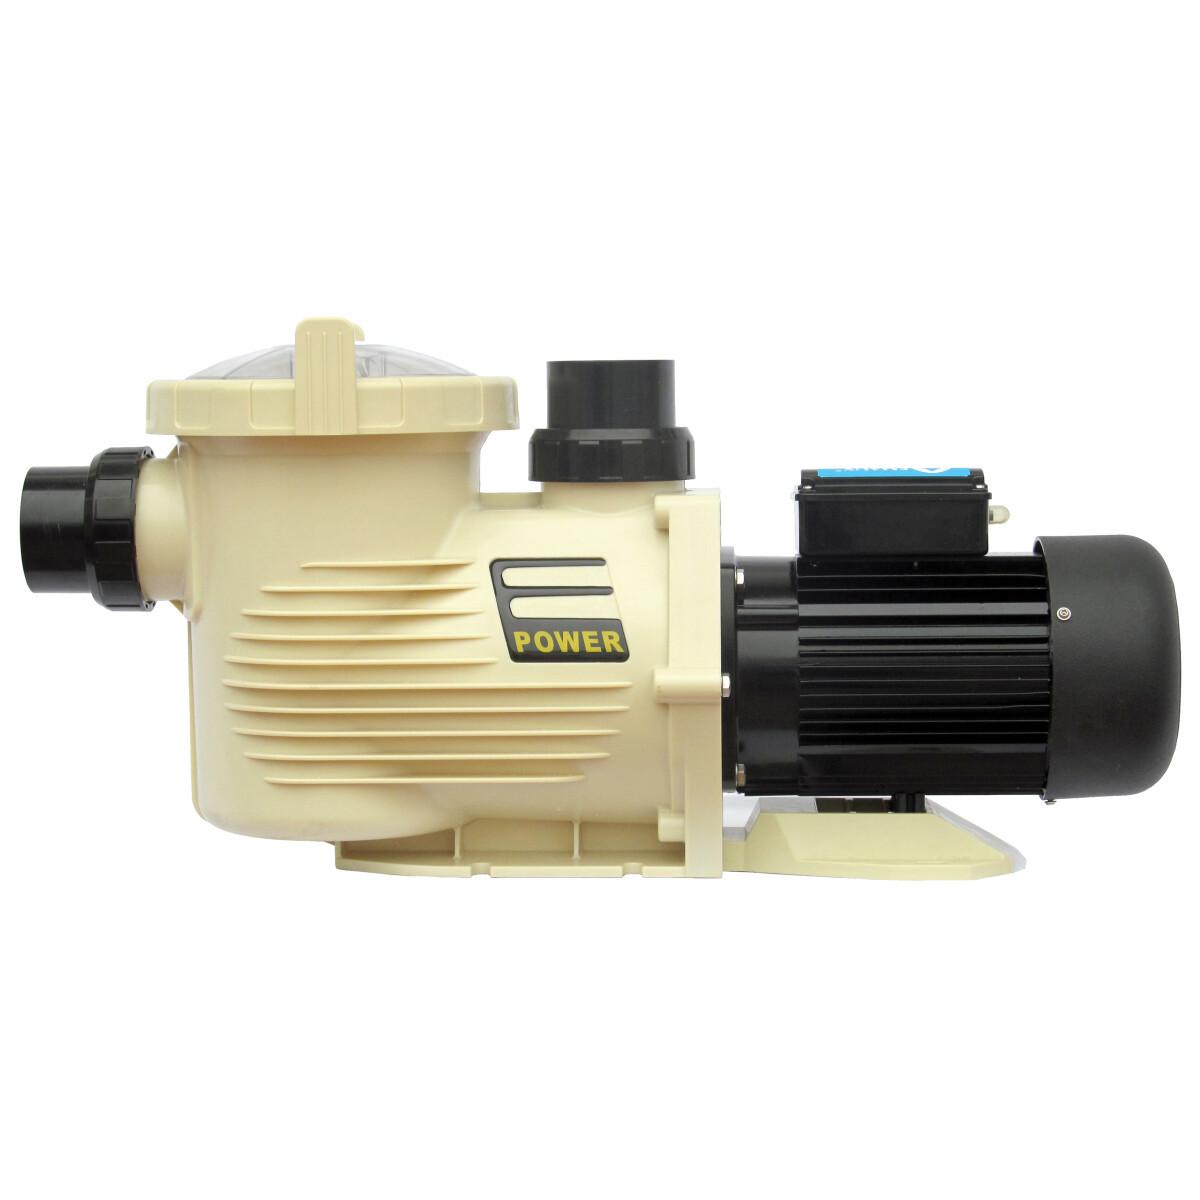 Насос Emaux EPH300 (380В, 32 м3/ч, 3HP)